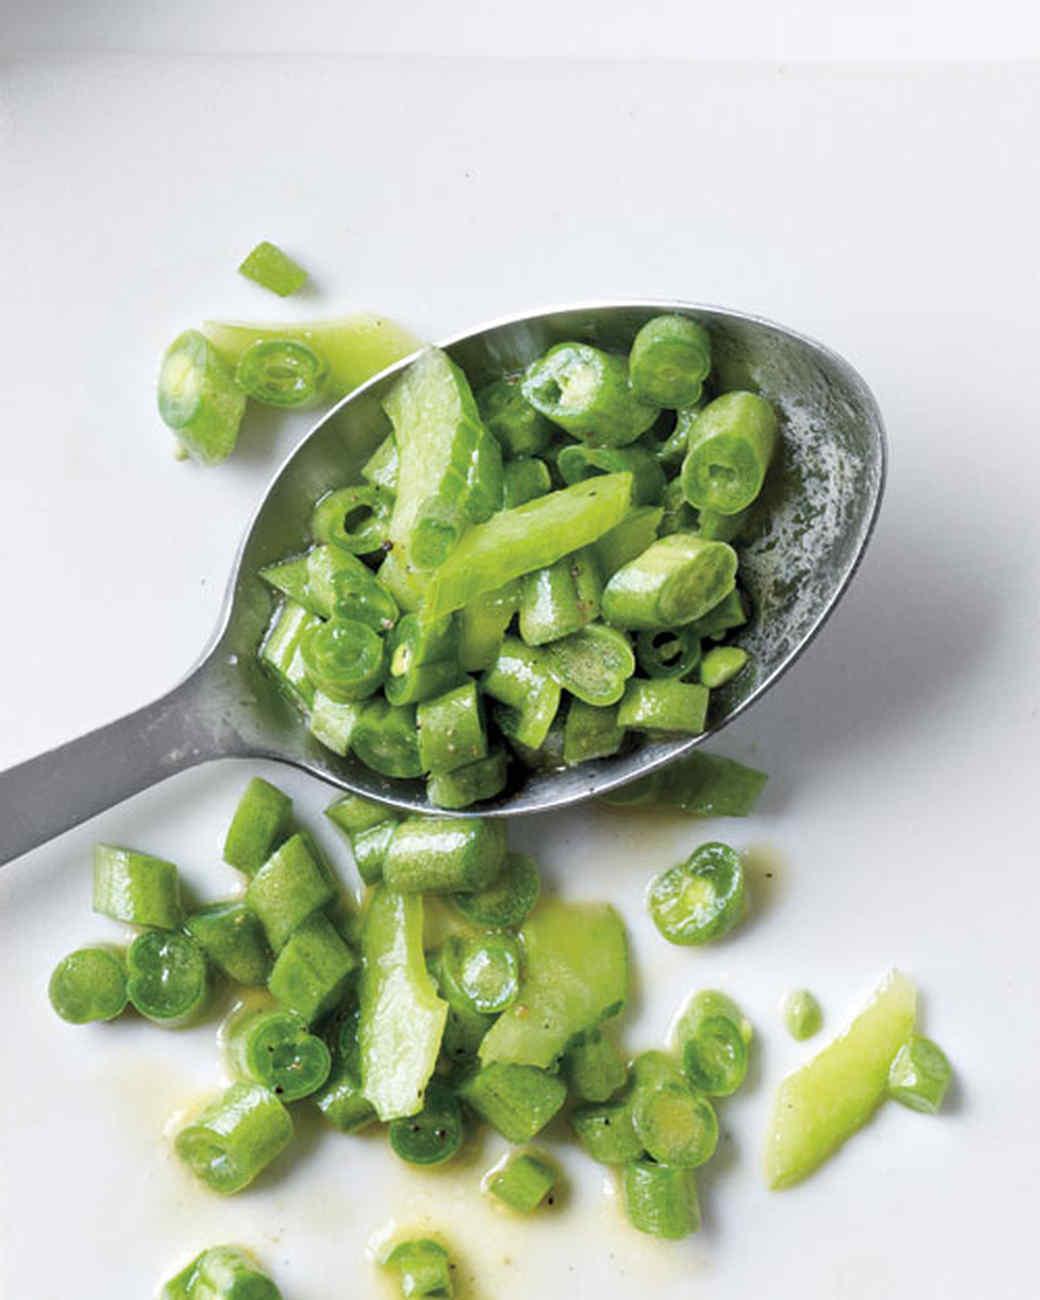 greenbean-celery-0711med107220-ots005copy.jpg